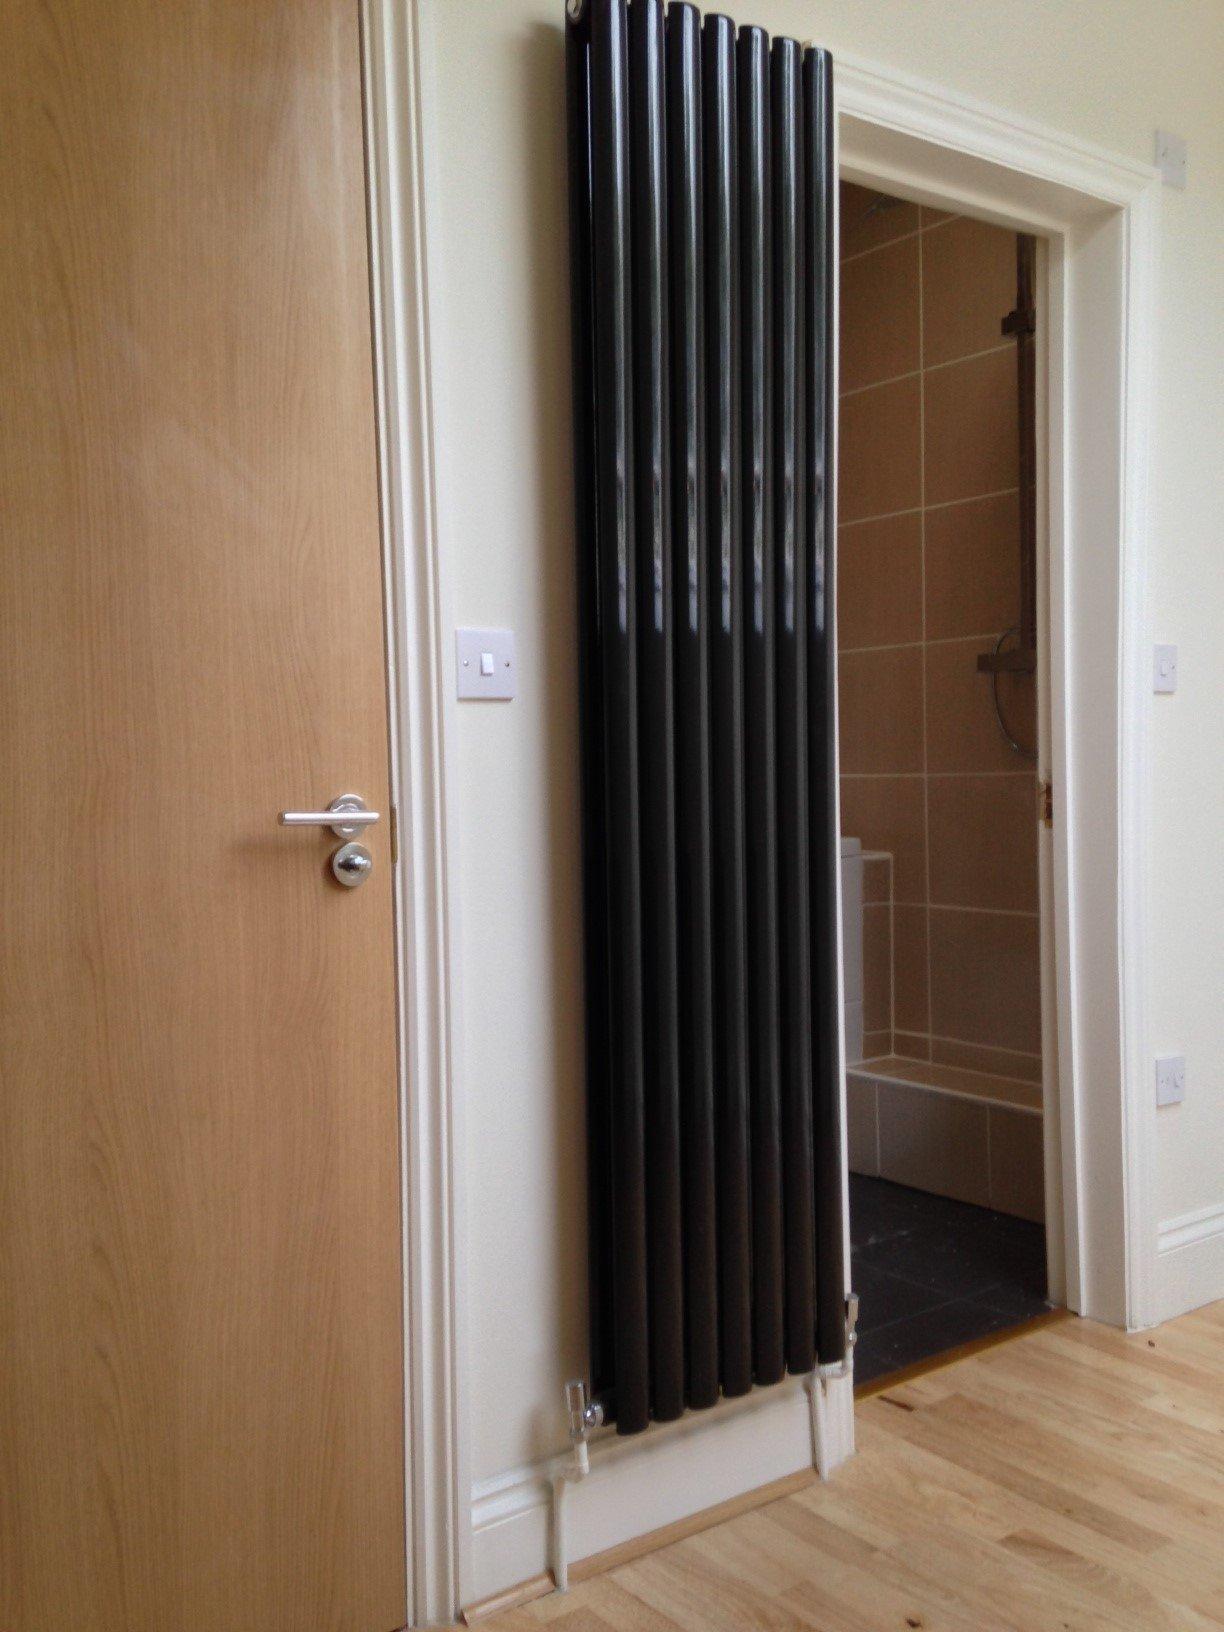 Designer radiator in loft